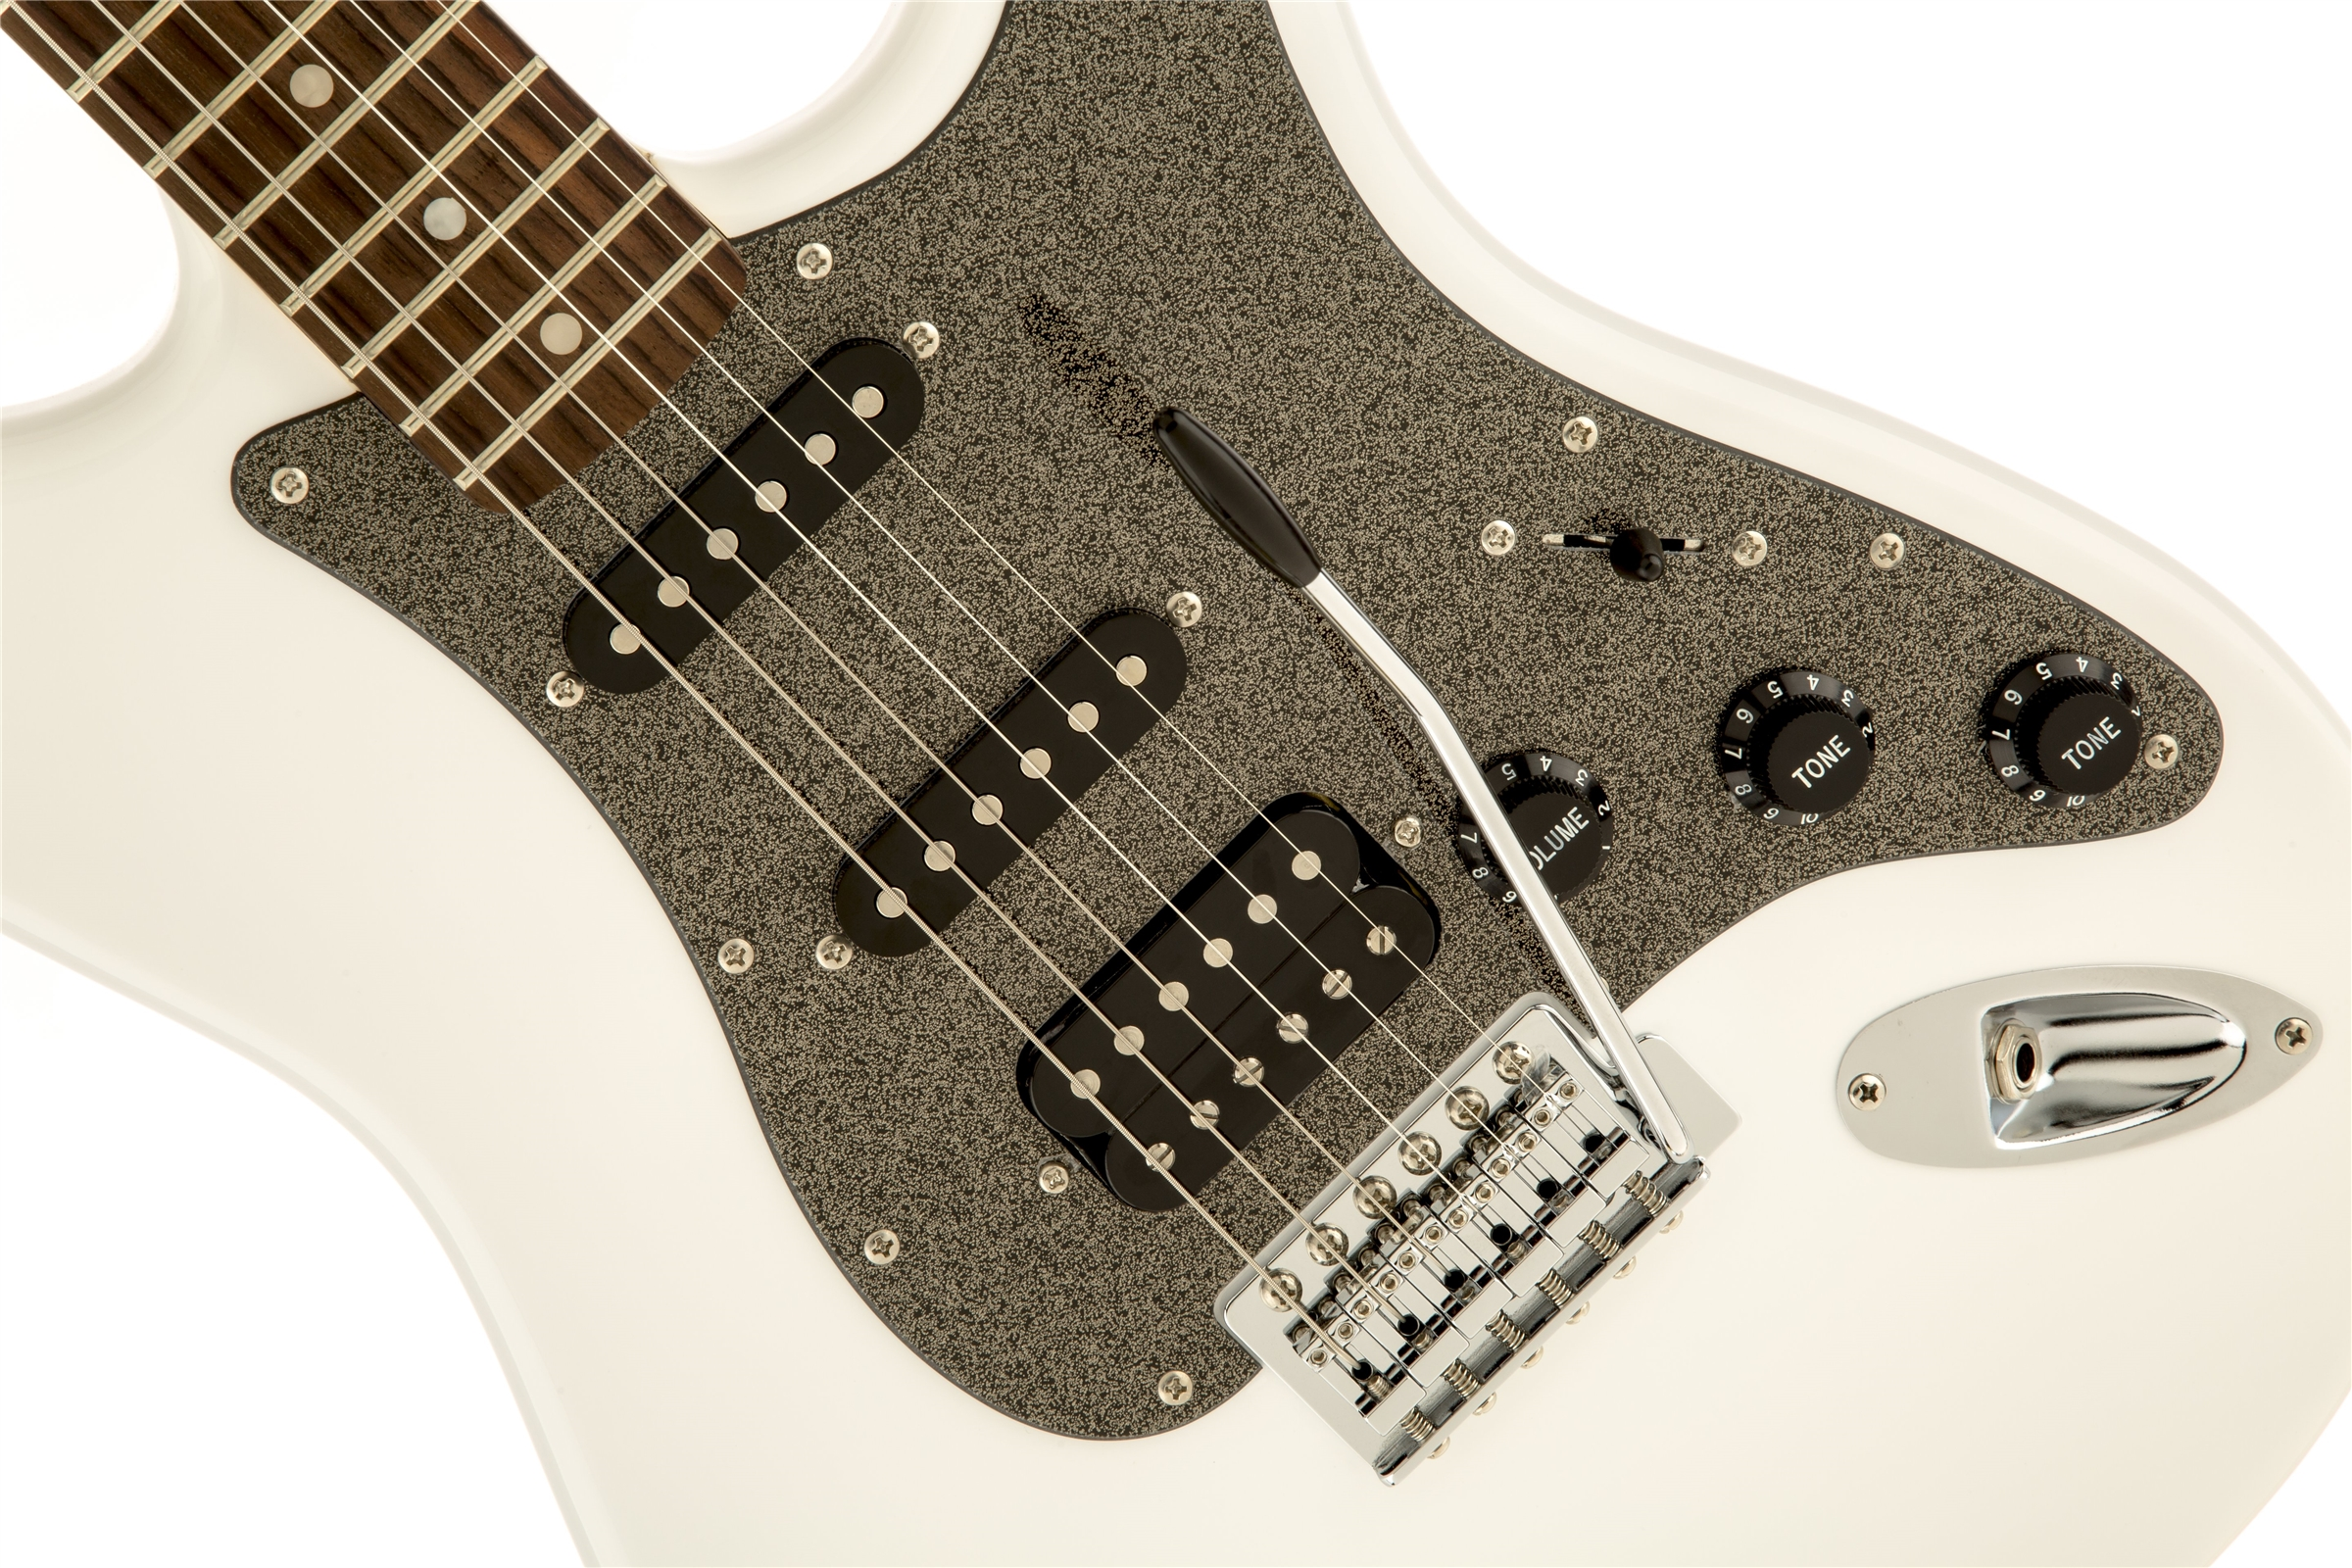 Affinity Series Stratocaster Hss Squier Electric Guitars Humbucker Strat Schematics